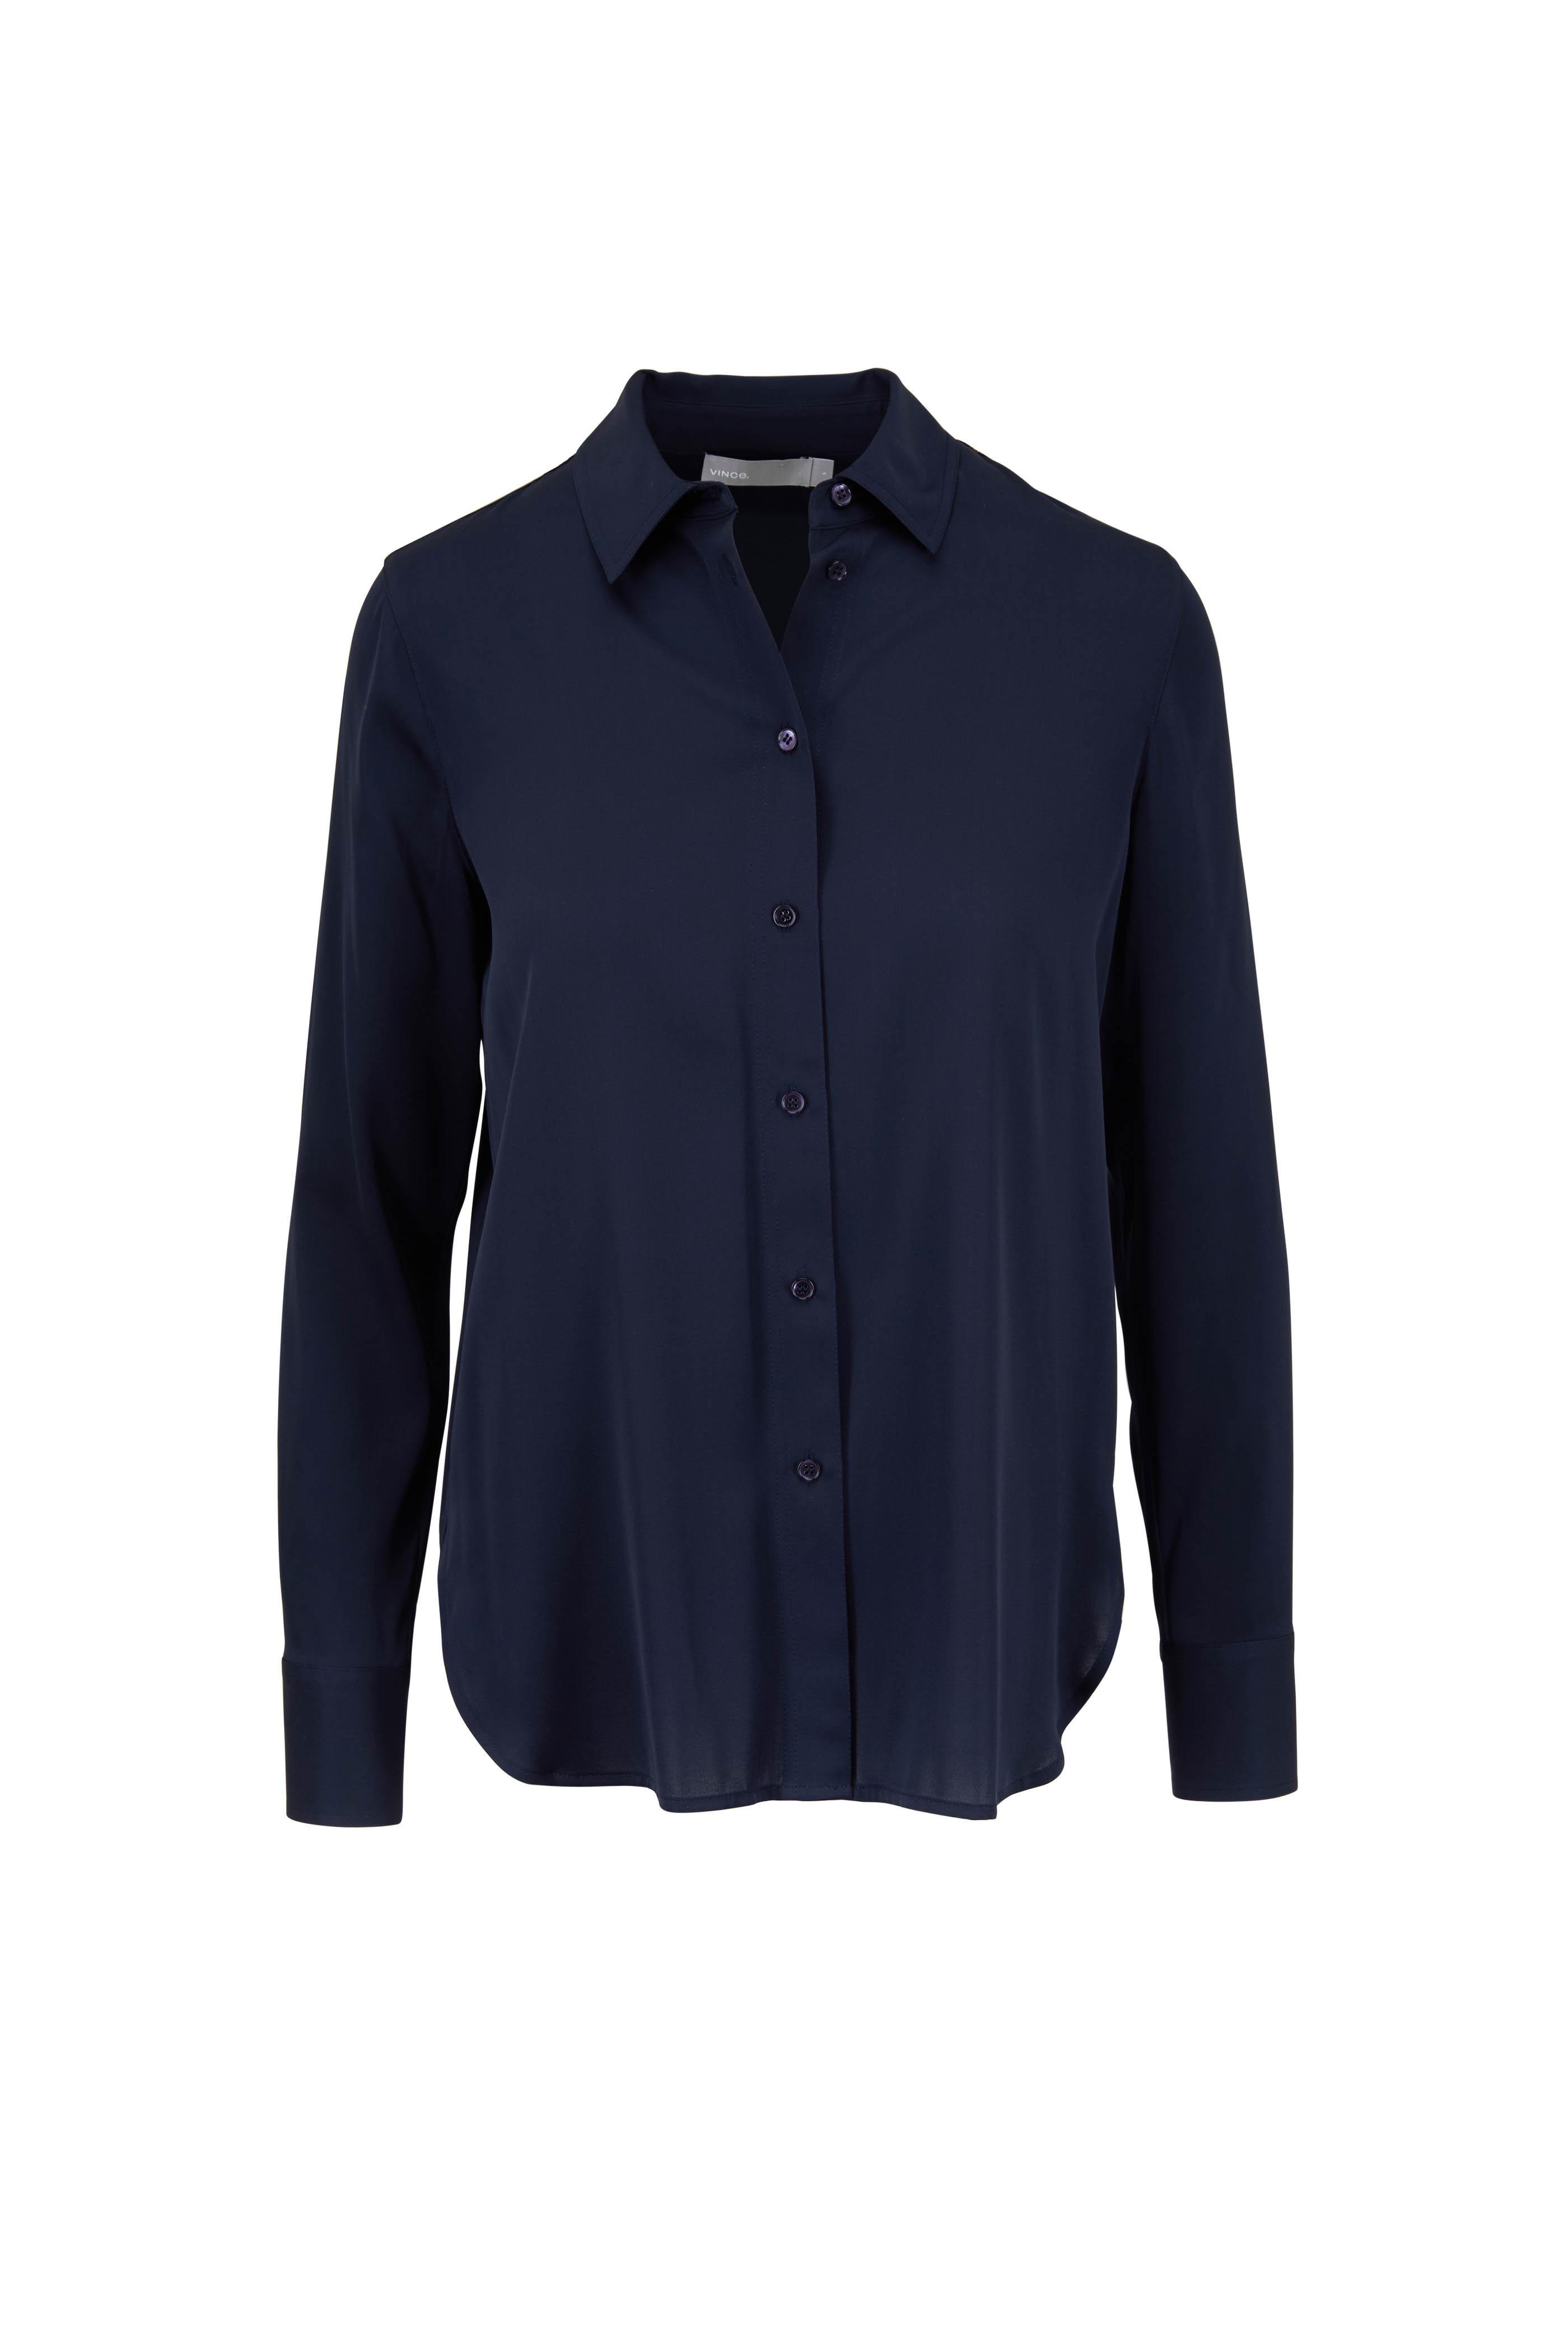 97de4276ba4ff6 Vince - Coastal Blue Silk Blouse